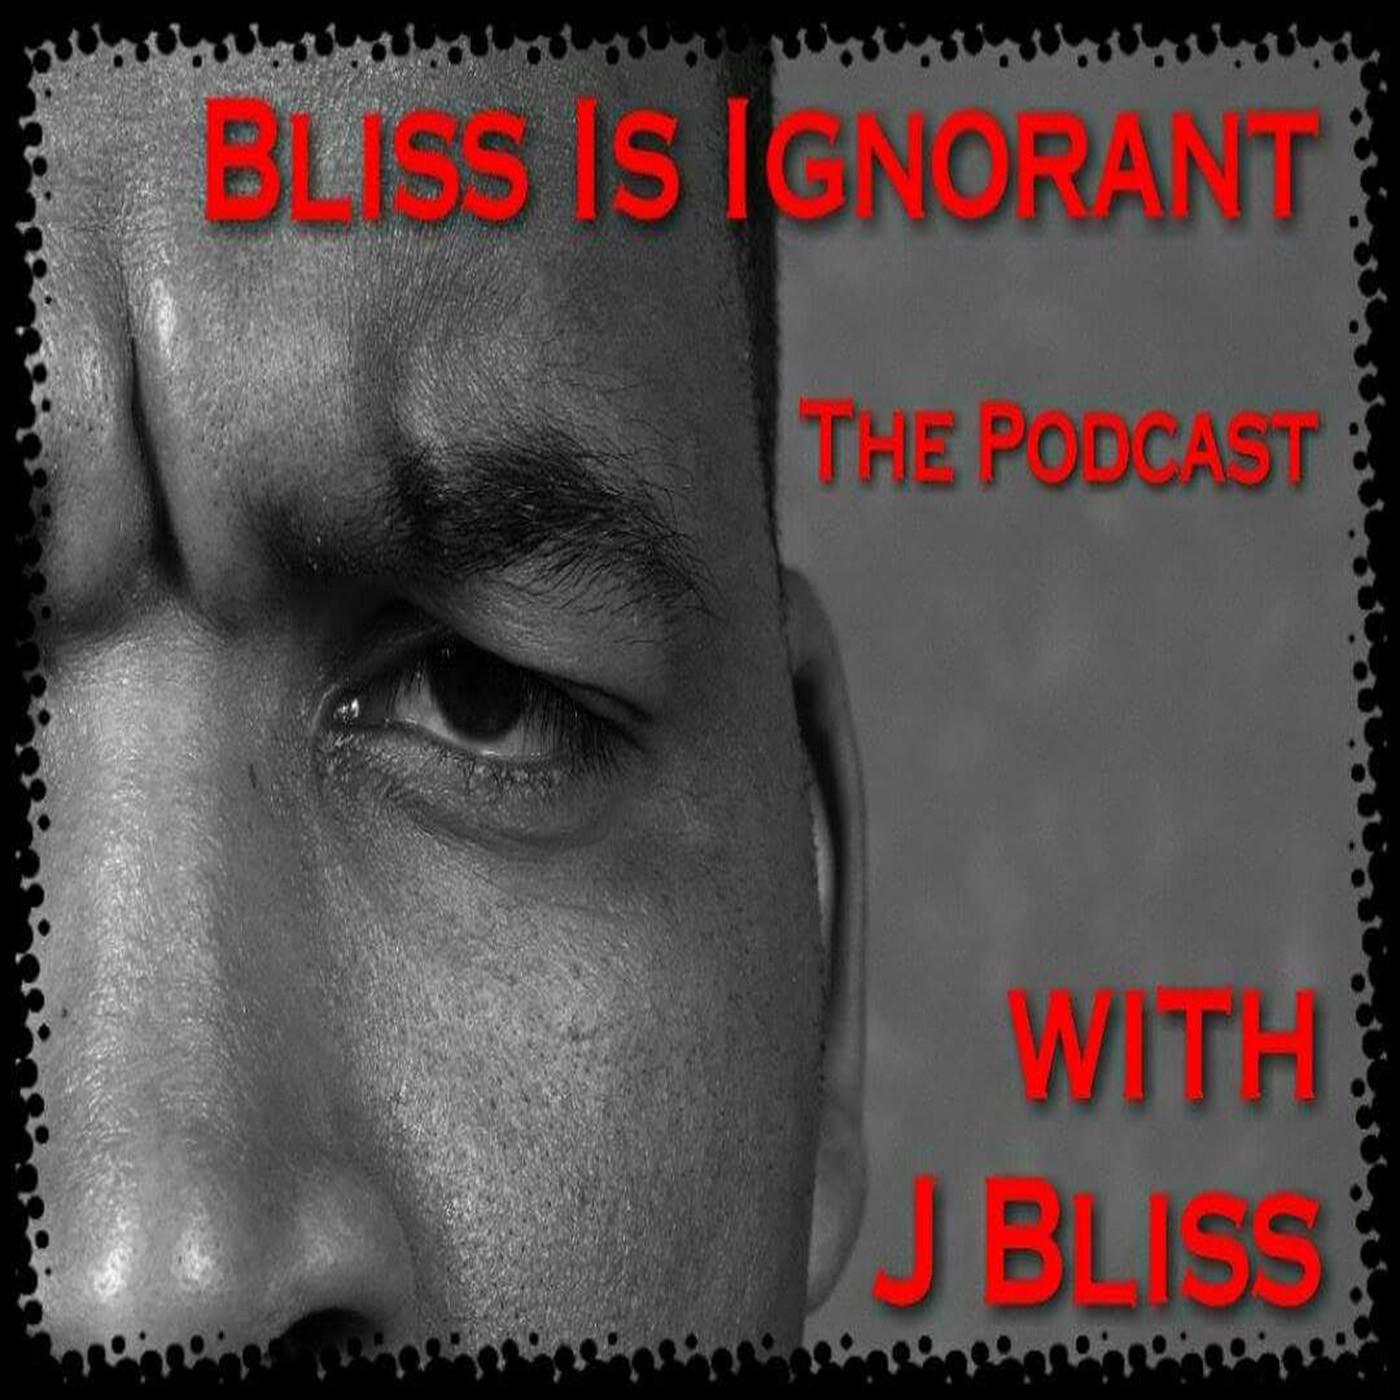 Bliss is ignorant ep # 64